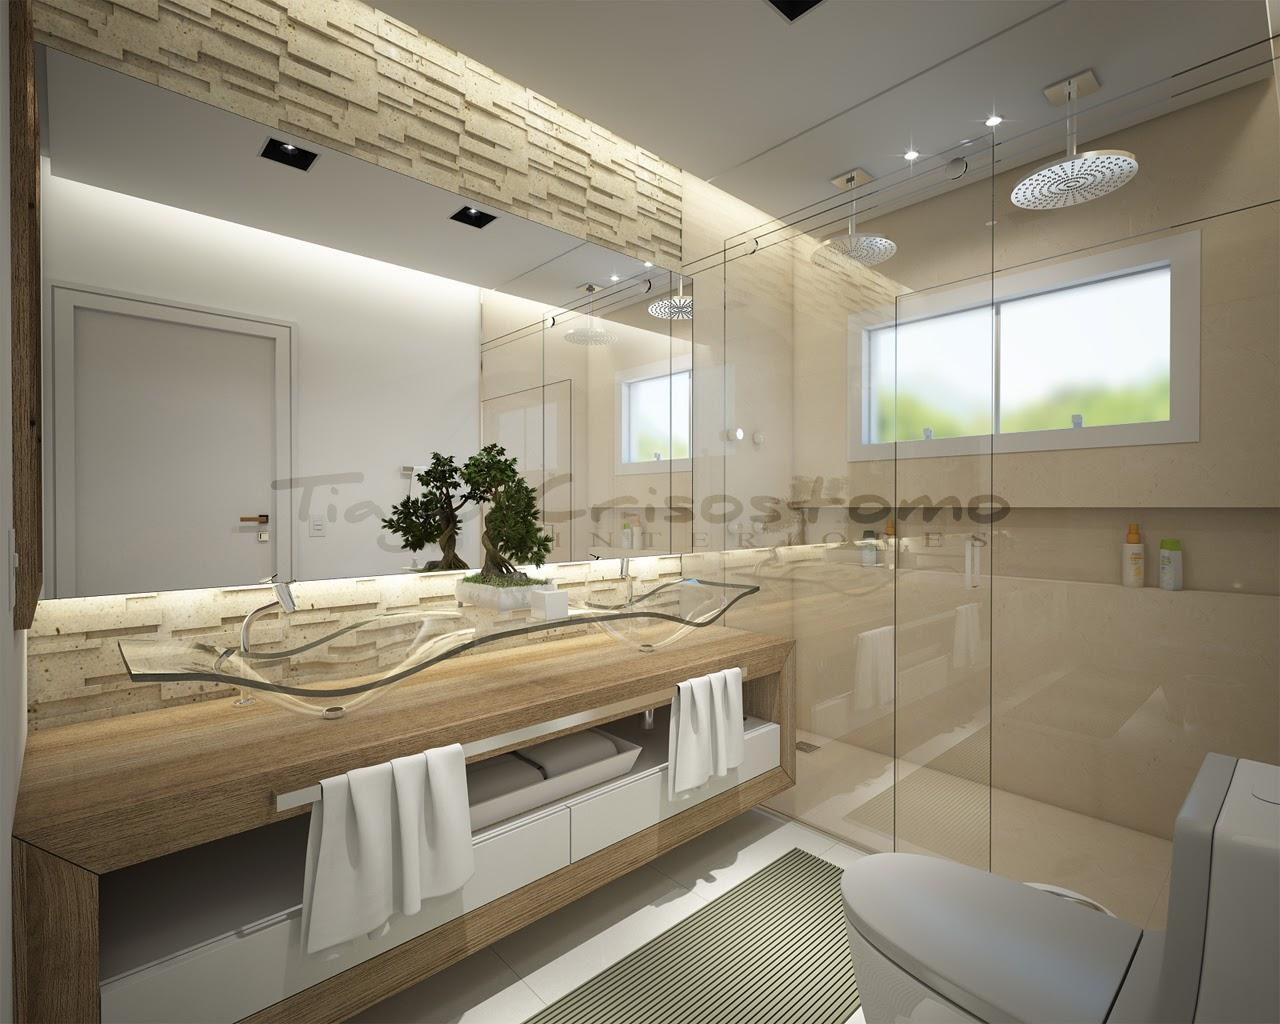 bancada amadeirada cubas de vidro lindas e dois chuveiros!! Um luxo #515935 1280x1024 Banheiro Bancada De Vidro